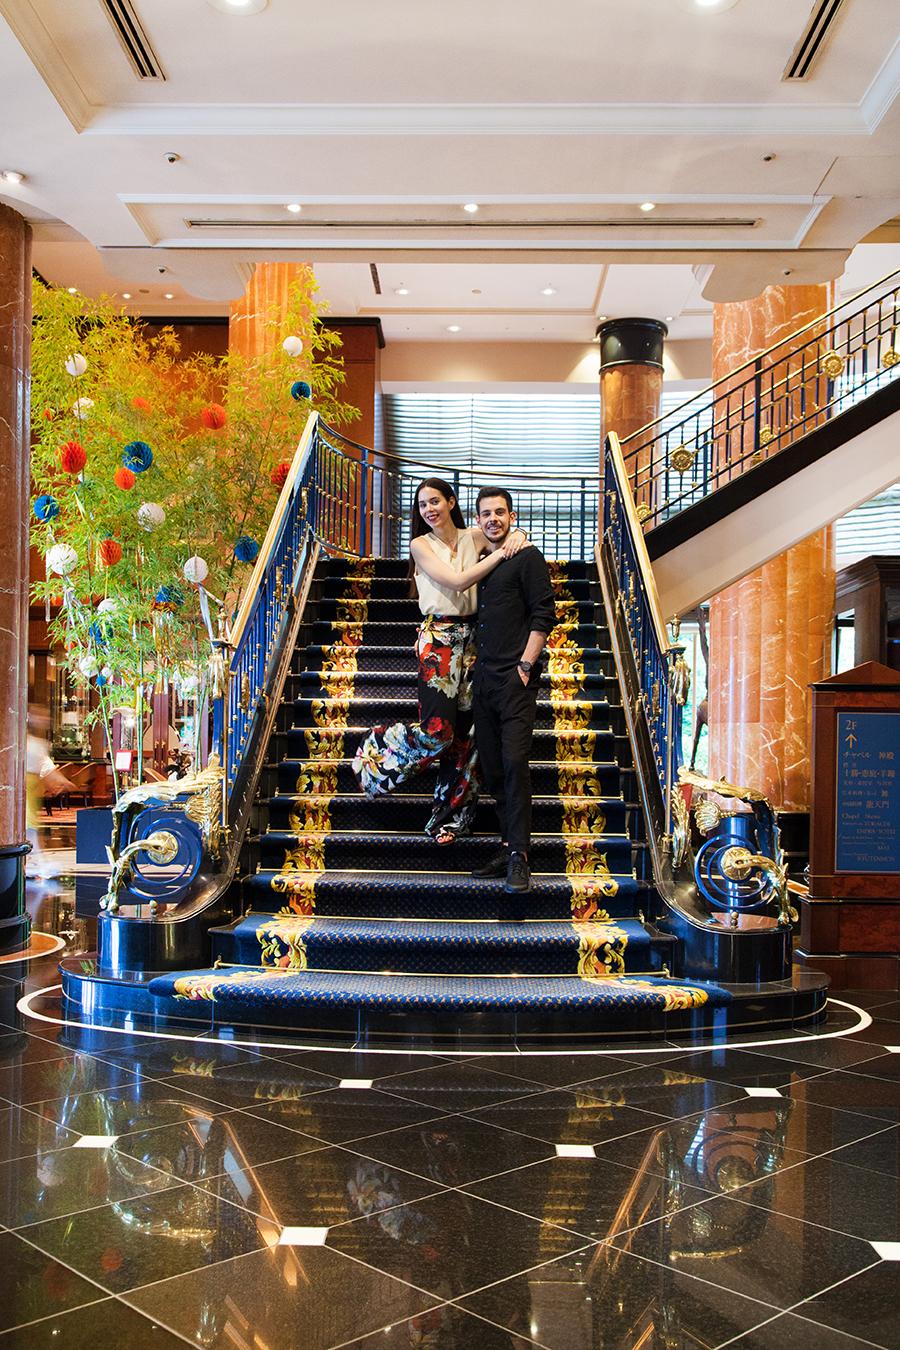 irene colzi e gabriele colzi hotel westin tokyo